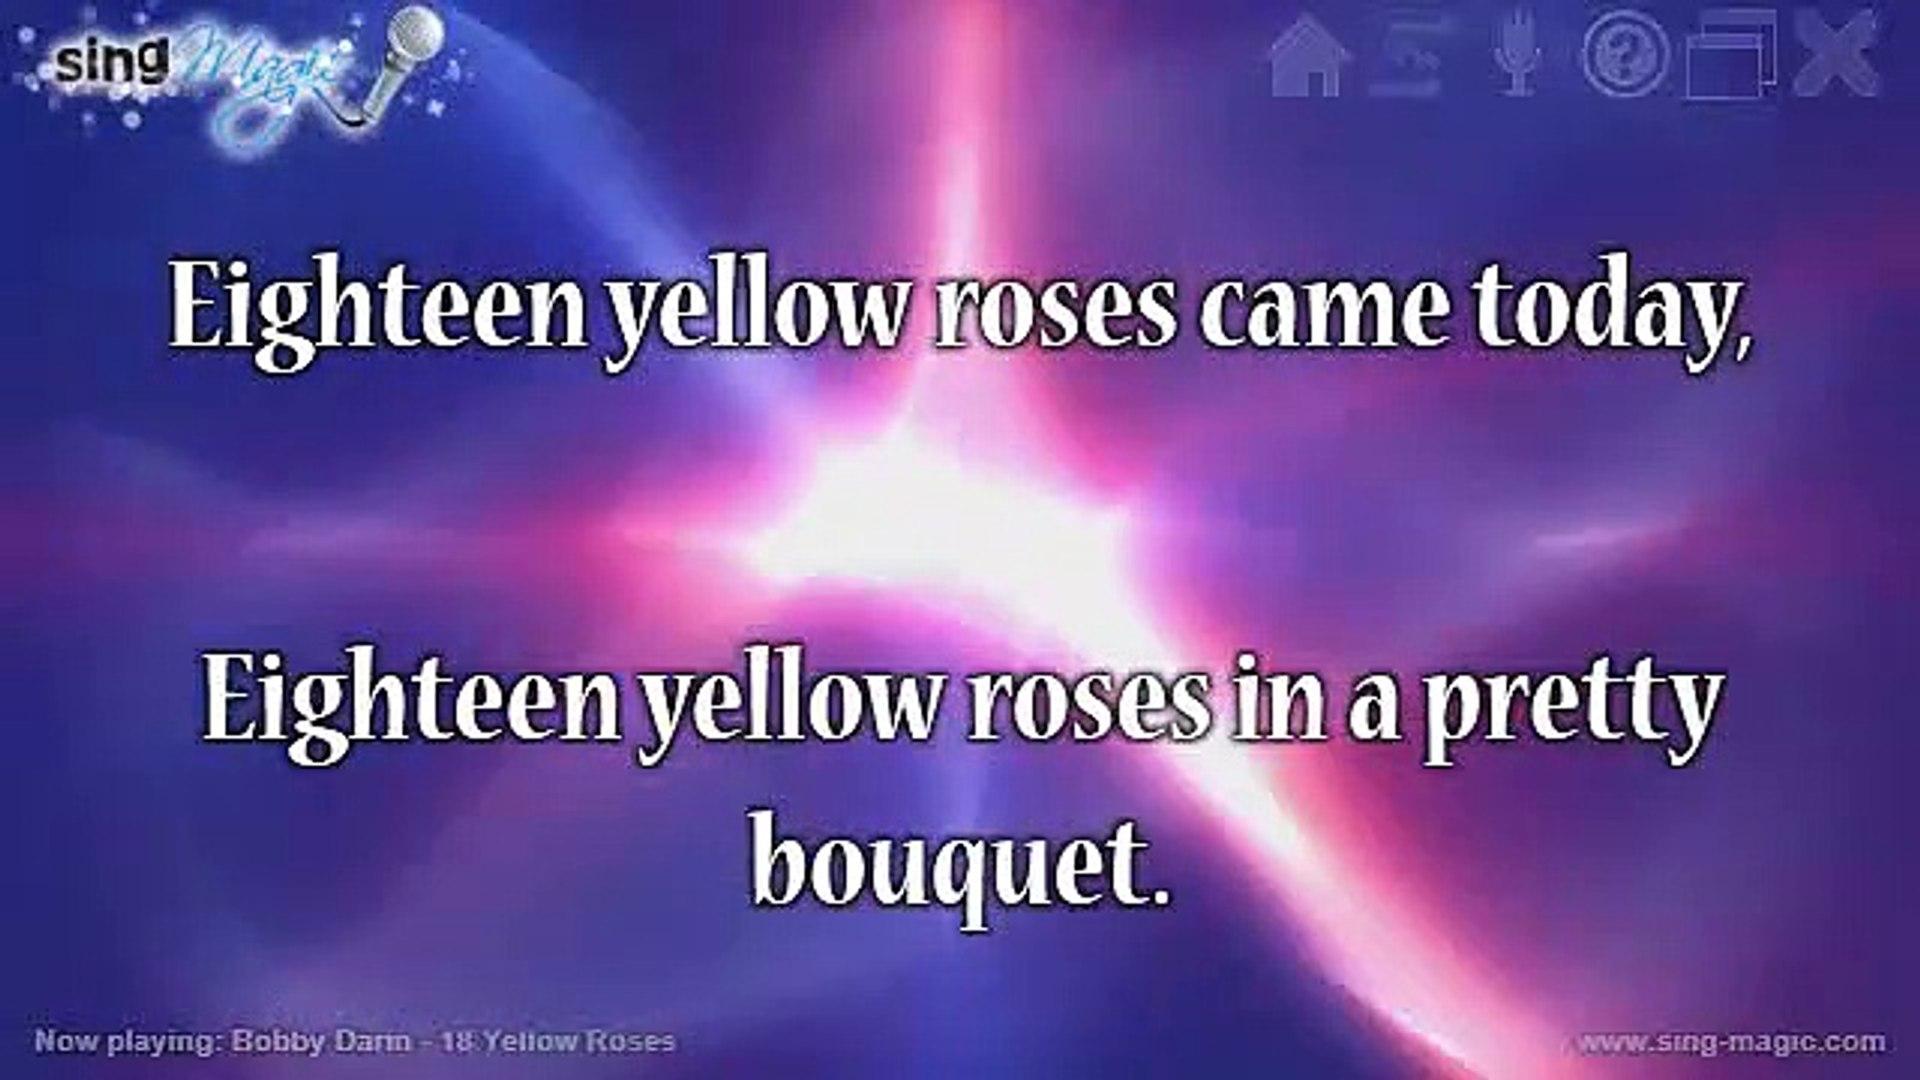 Bobby Darin - 18 Yellow Roses Karaoke Version Instrumental